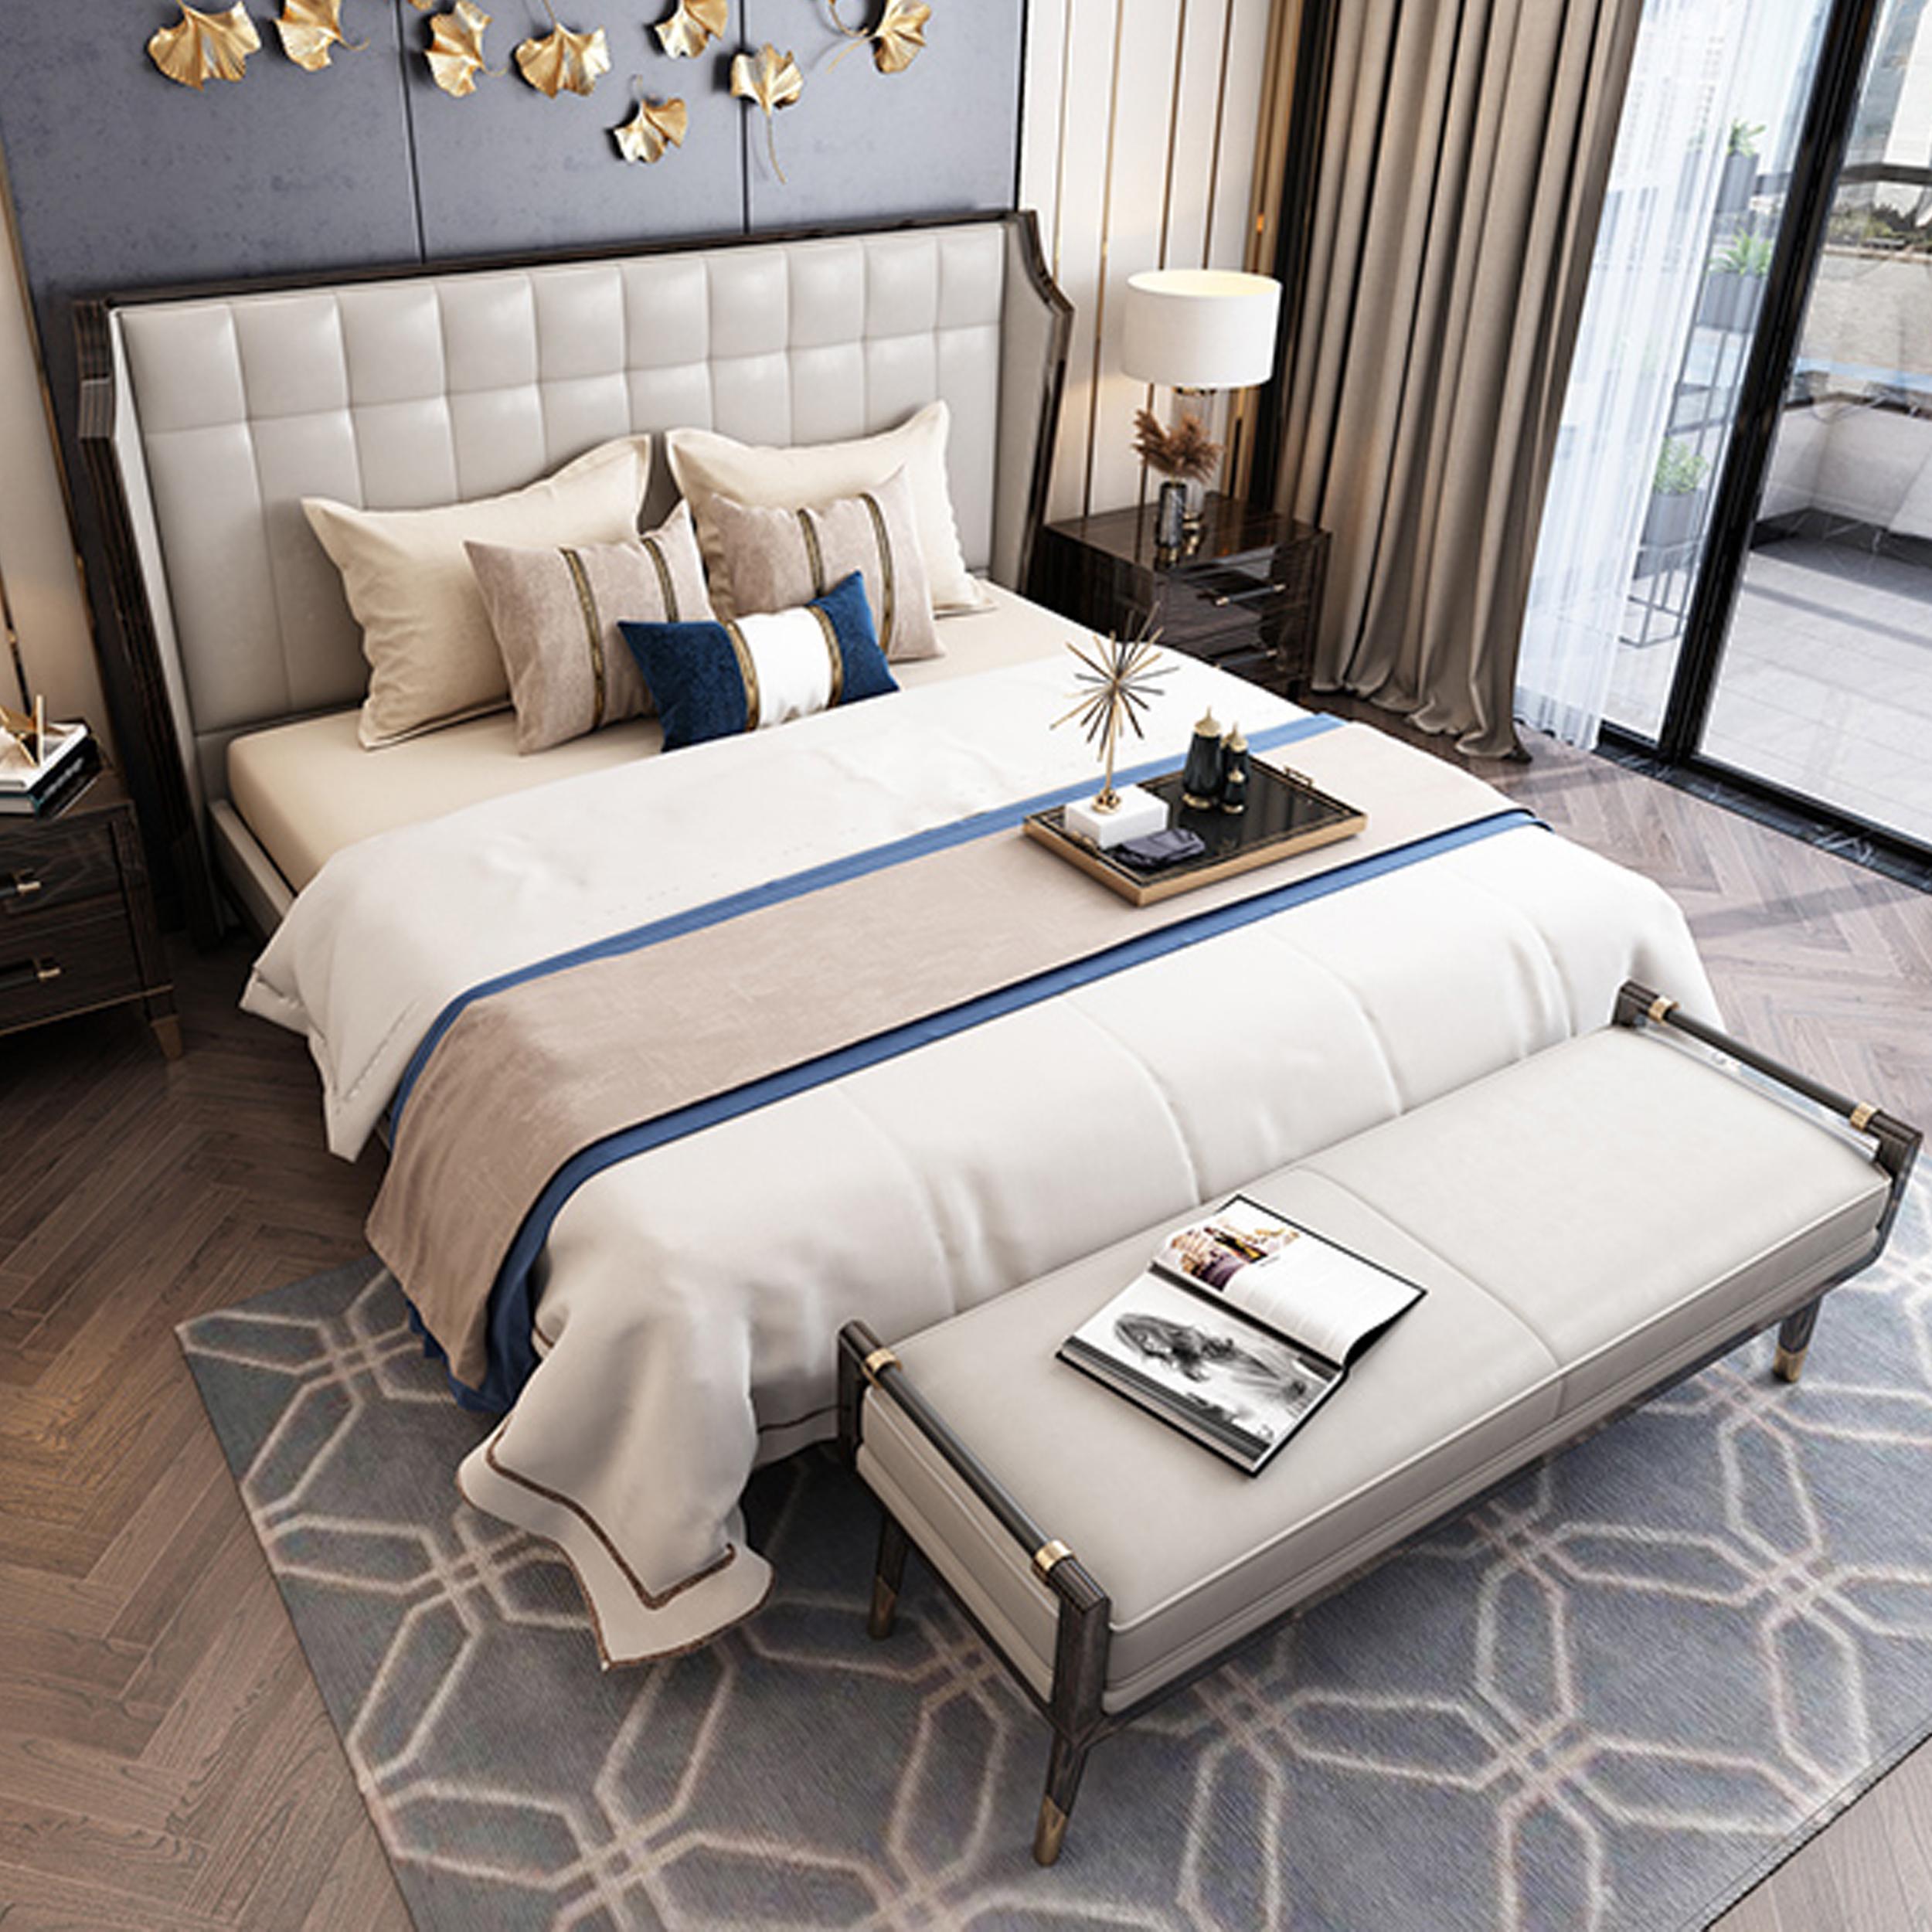 American Vip Teen Pvc Bedroom Furniture Solid Wood Buy American Bedroom Furniture Bedroom Furniture Solid Wood Pvc Bedroom Furniture Product On Alibaba Com